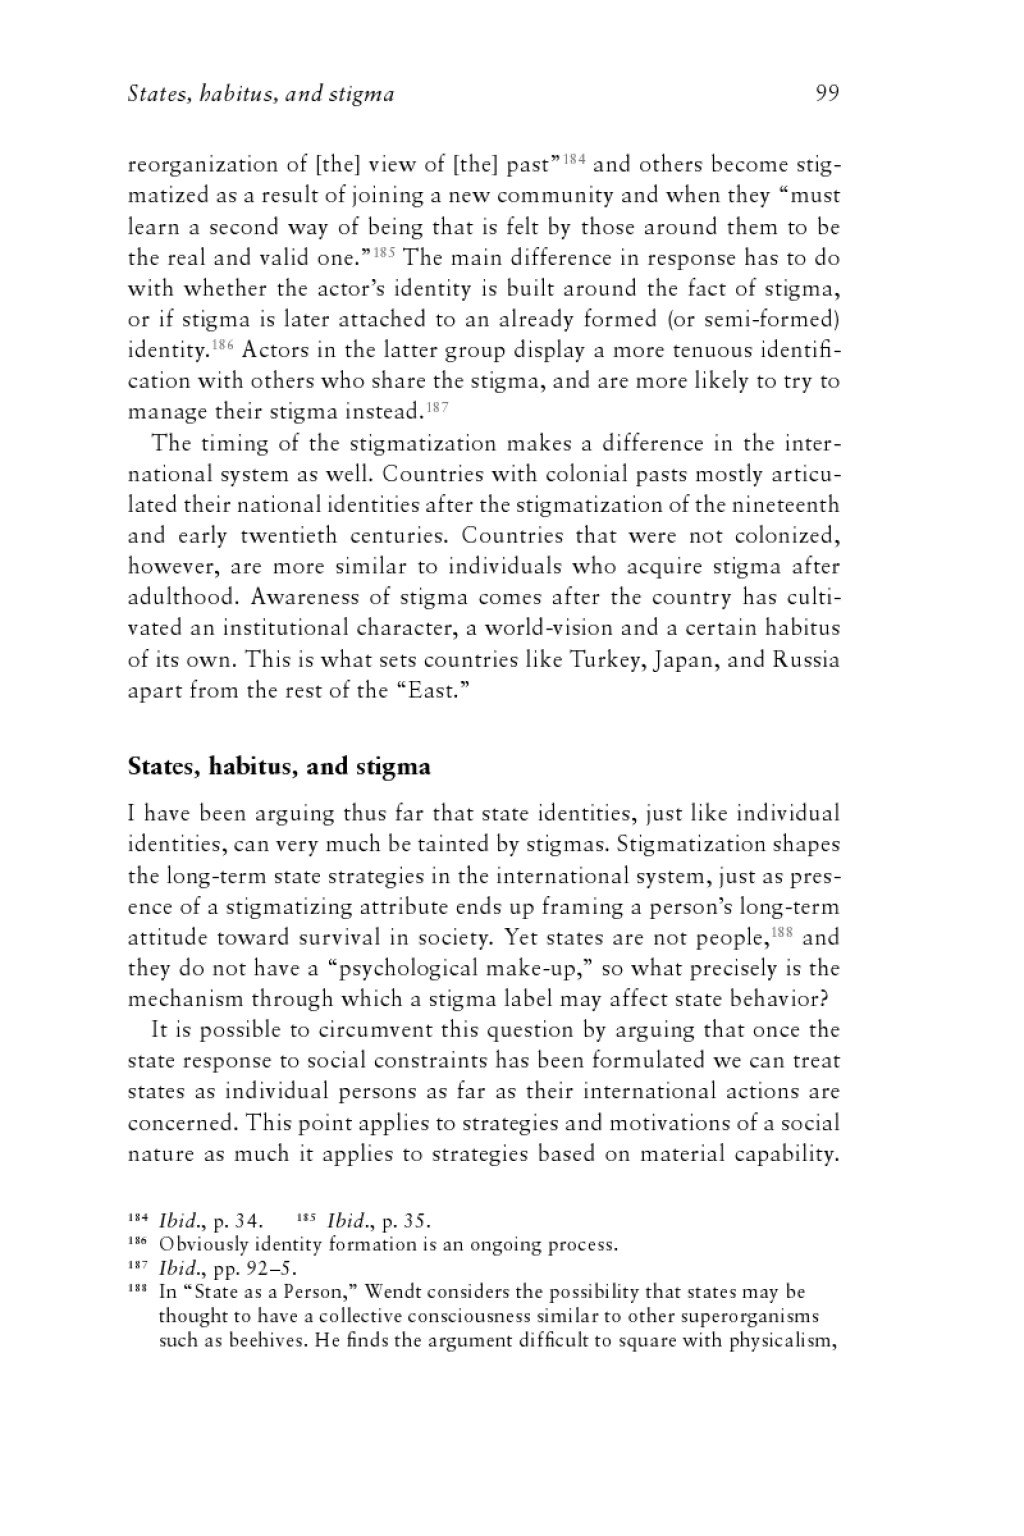 001 Njhs Essay Conclusion Example Sample National Junior Honor Society Topics Za Unique Large